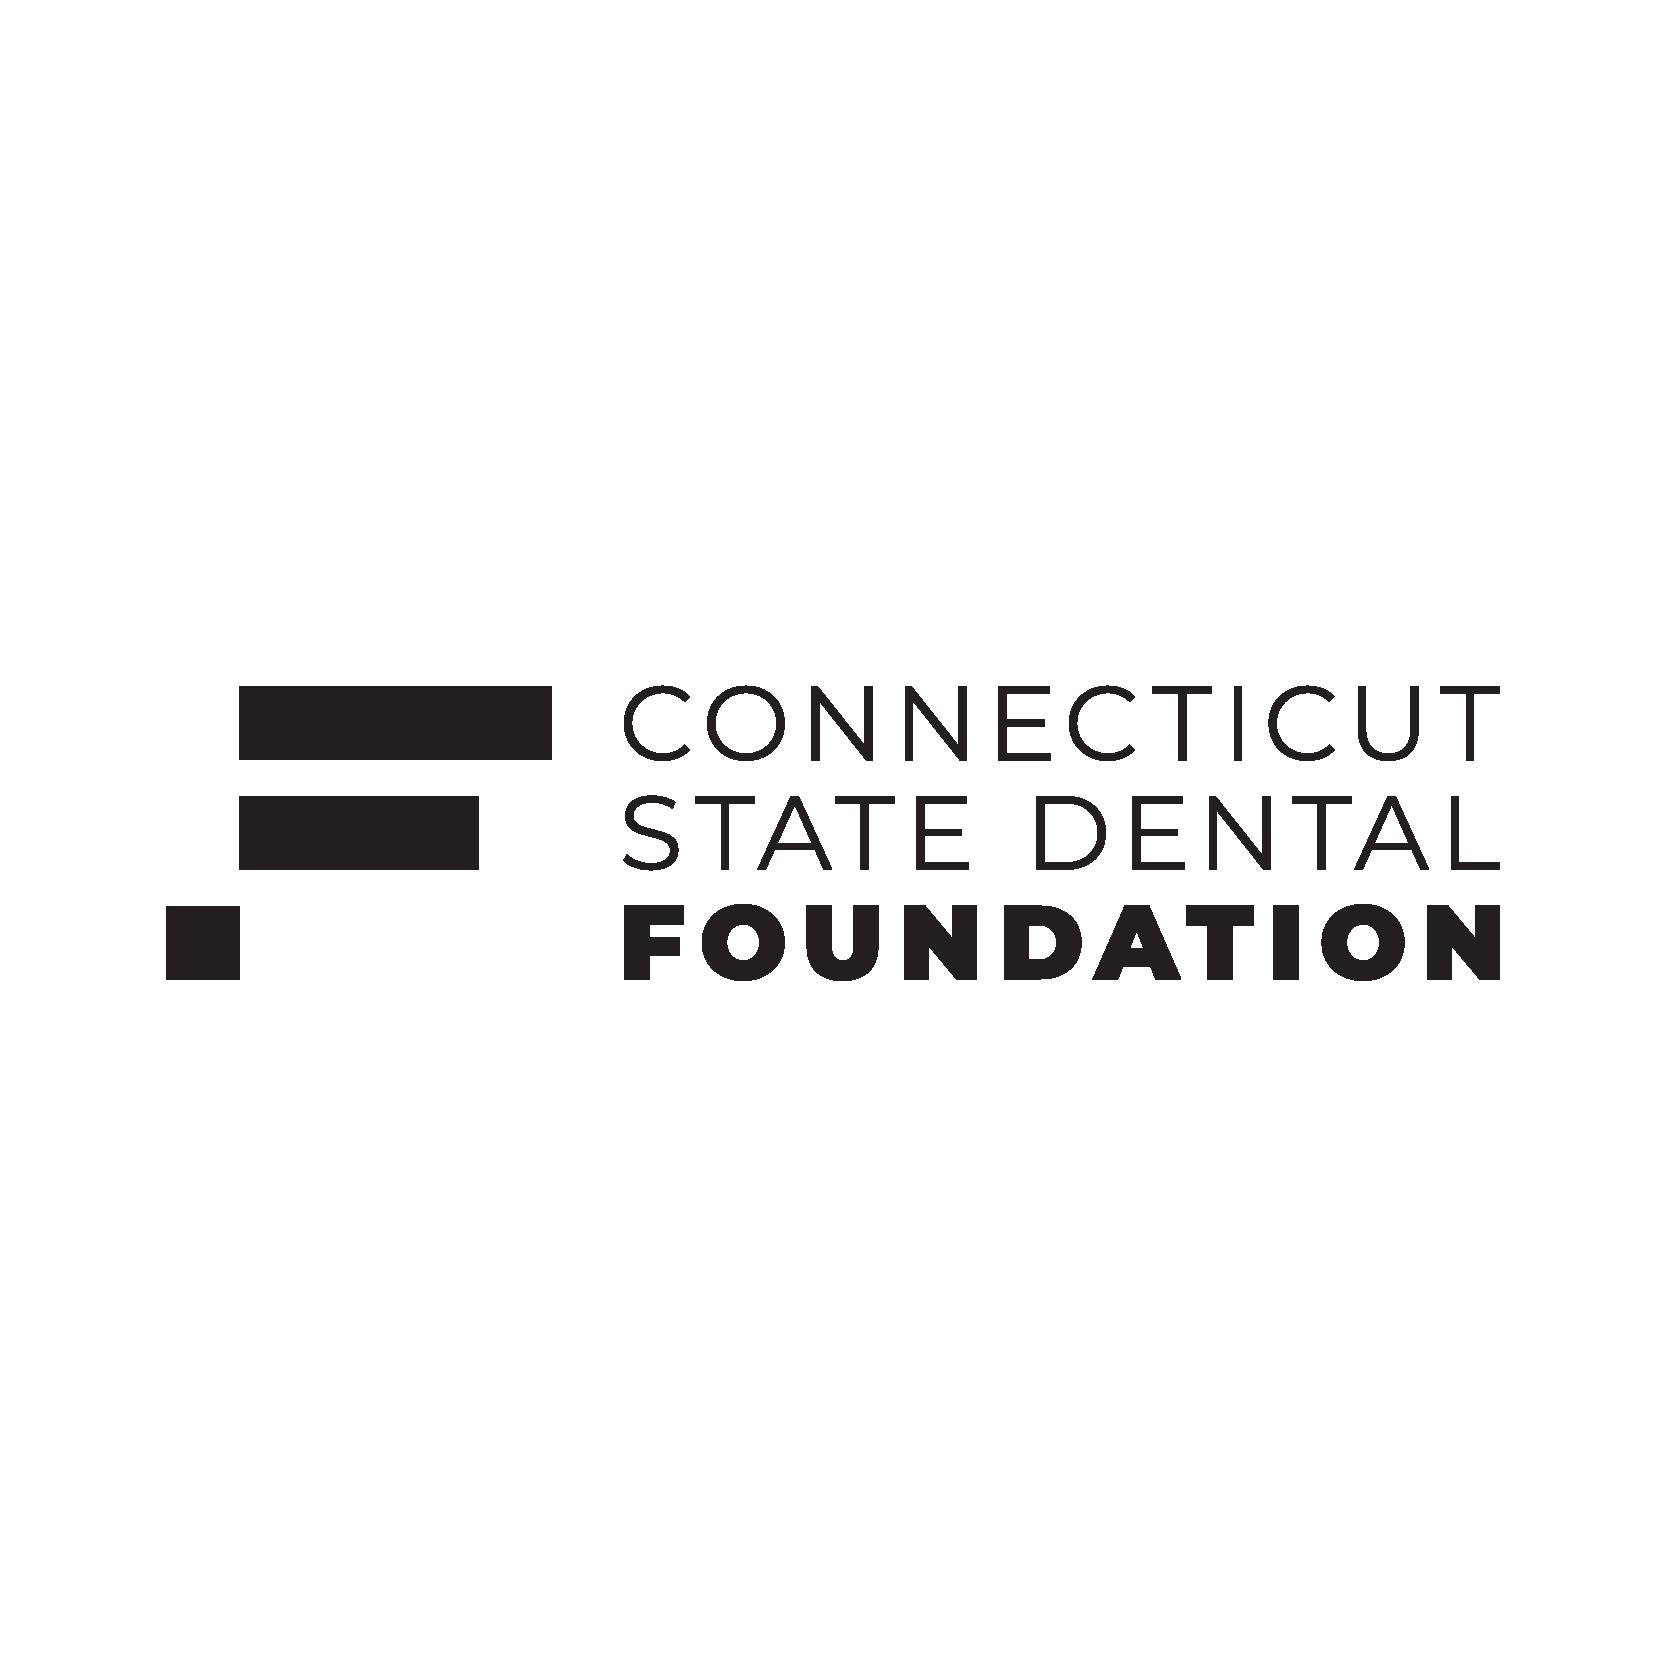 Connecticut State Dental Foundation Client Logo